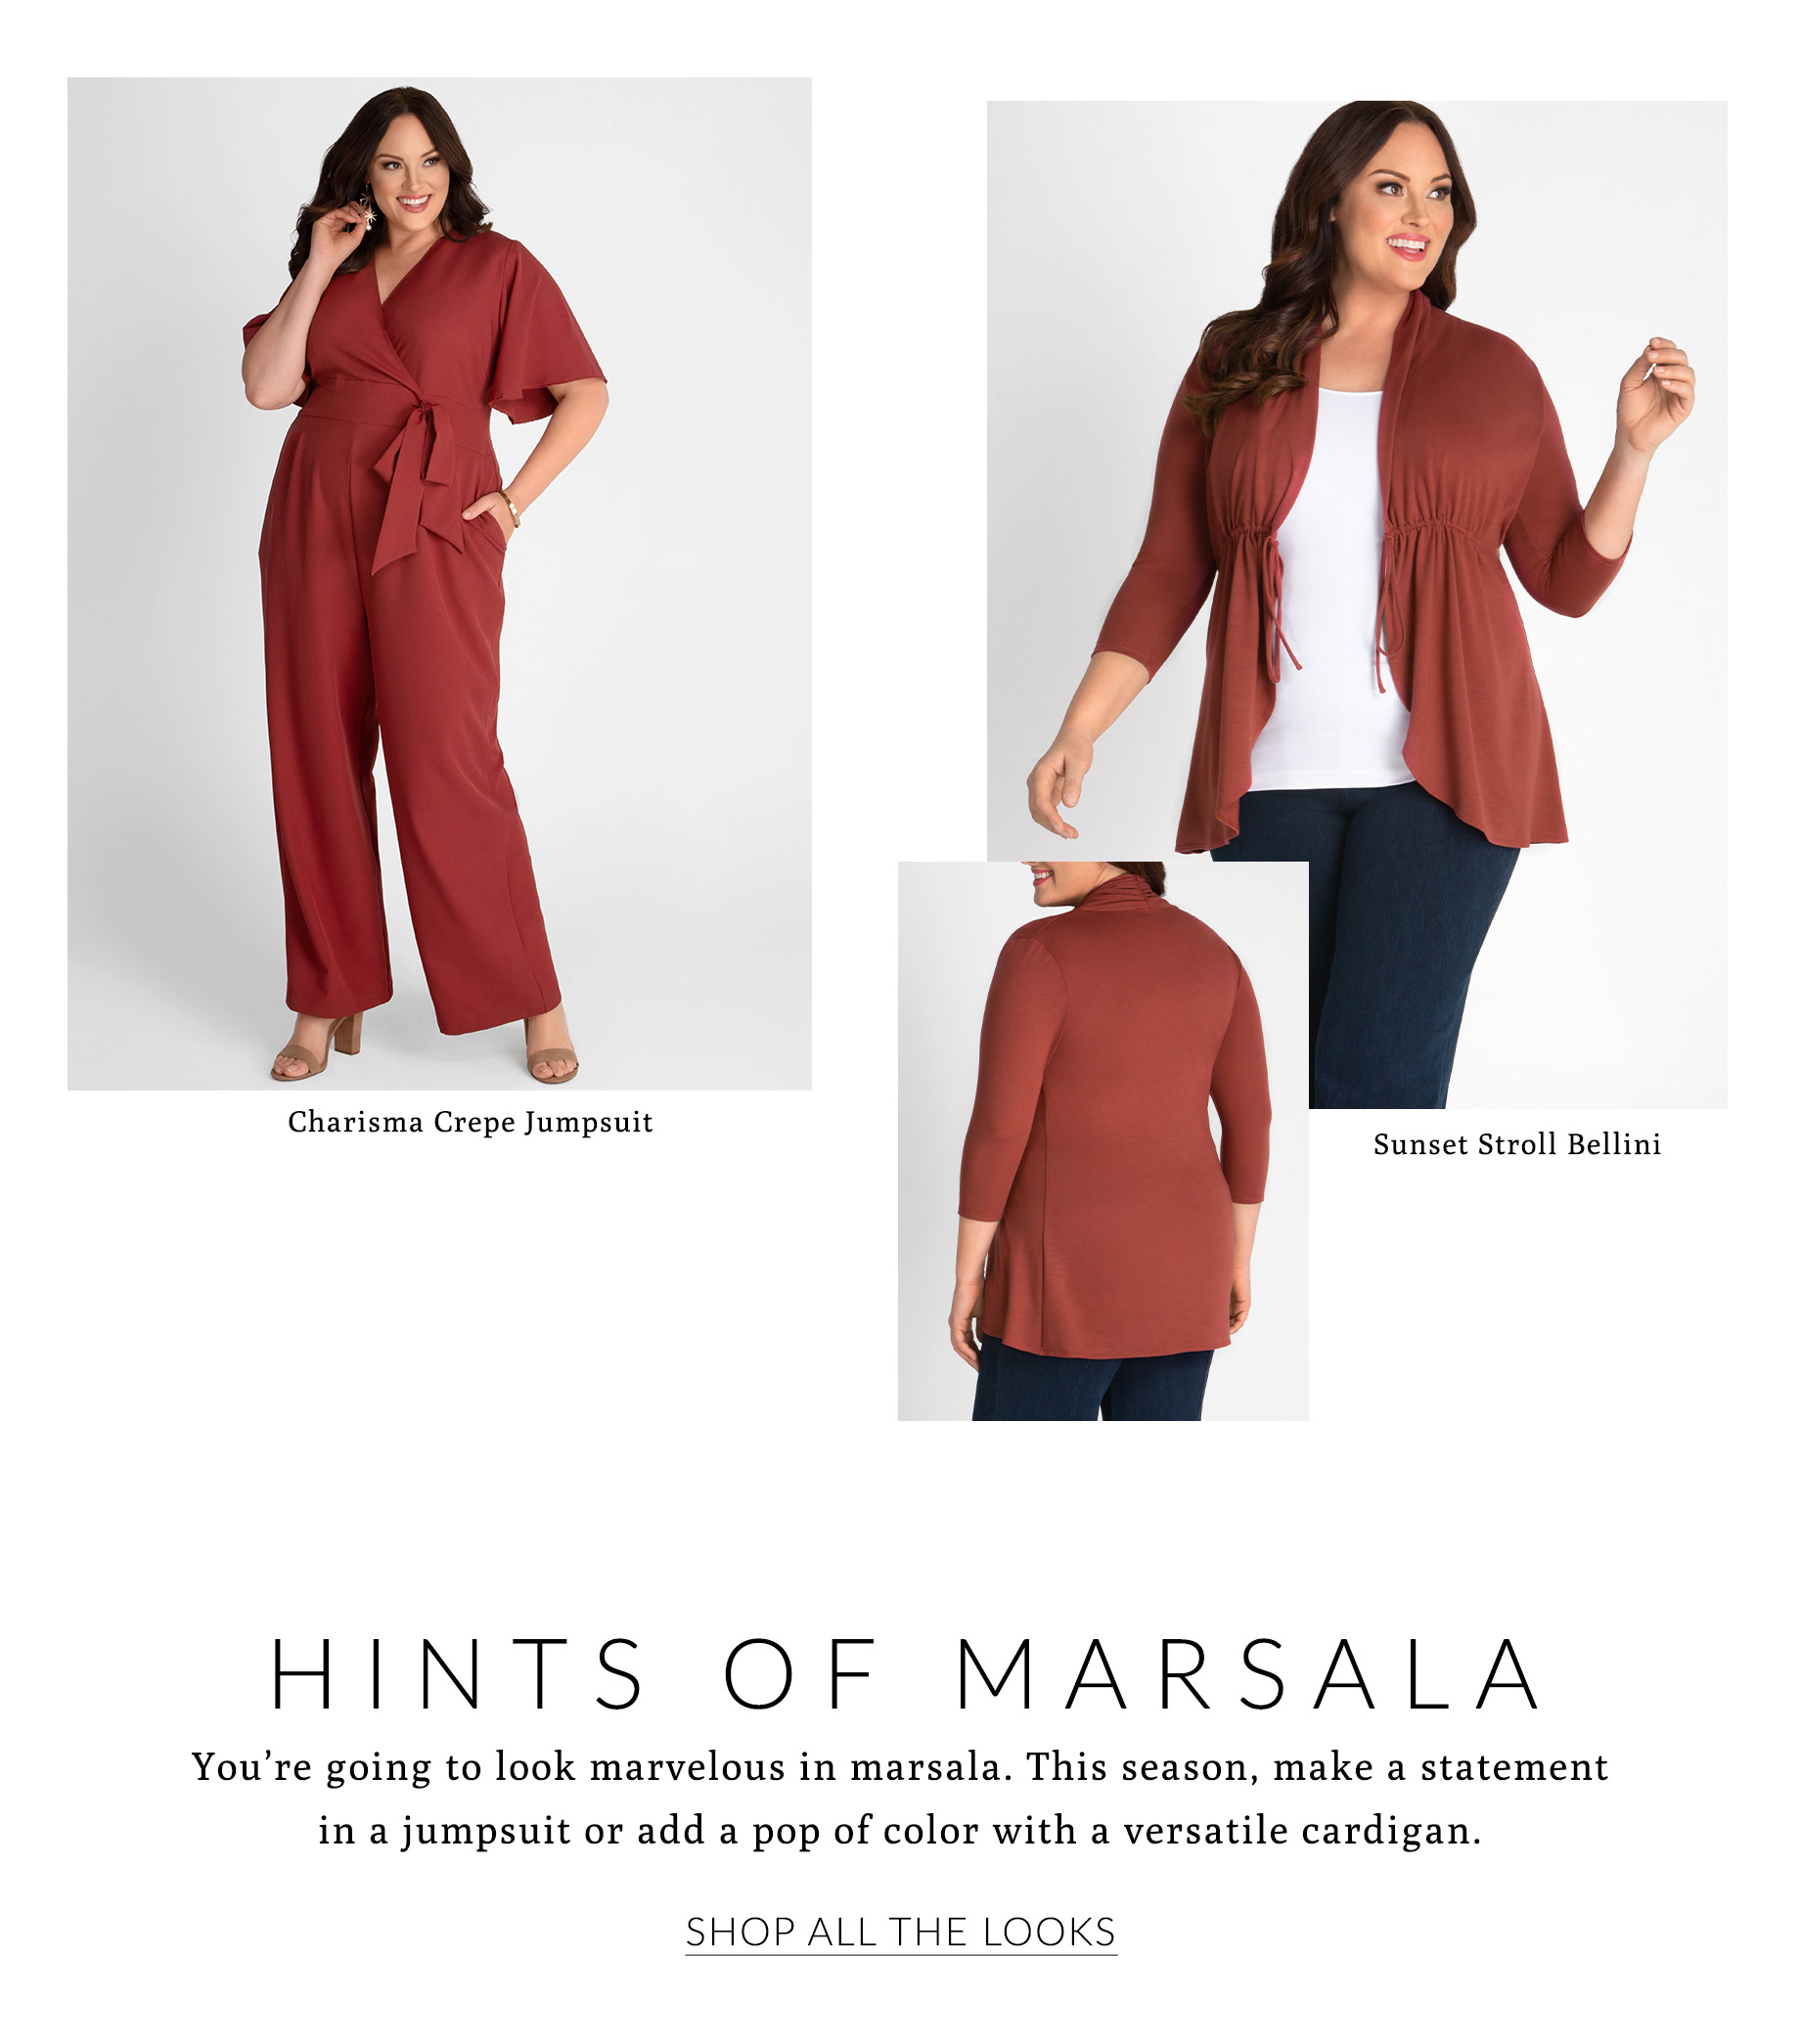 Hints of Marsala